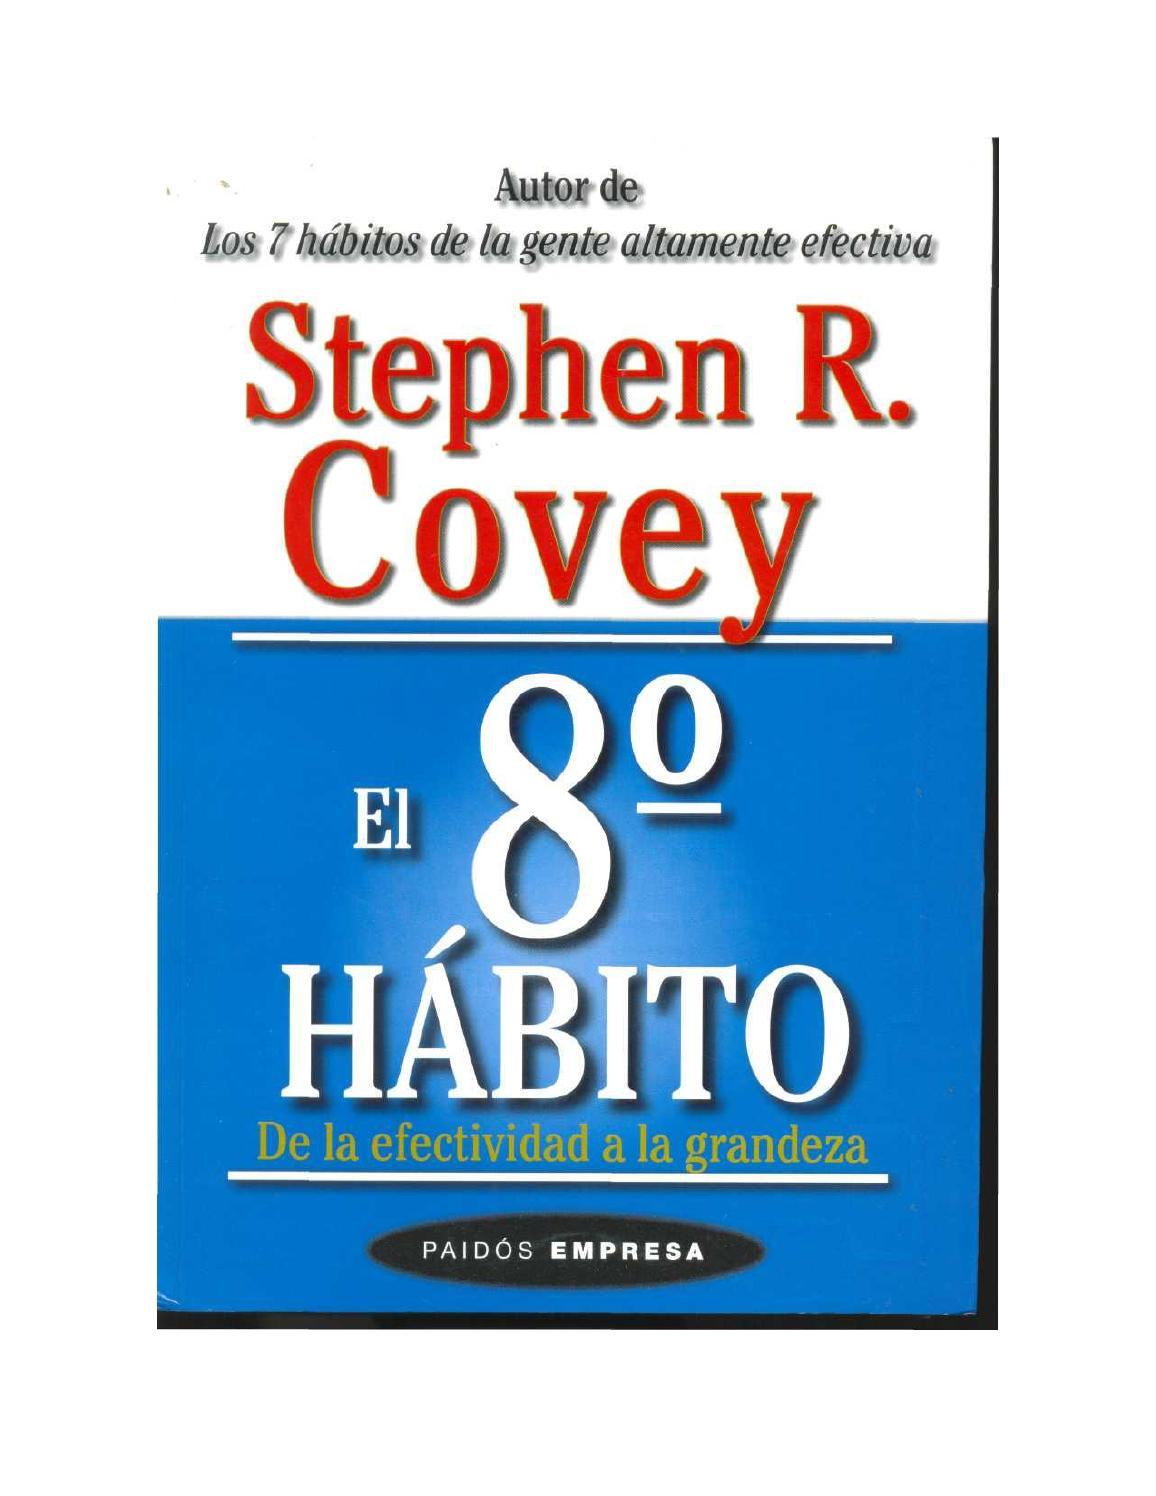 Covey stephen r el 8vo habito by Erwin Aguilar - issuu